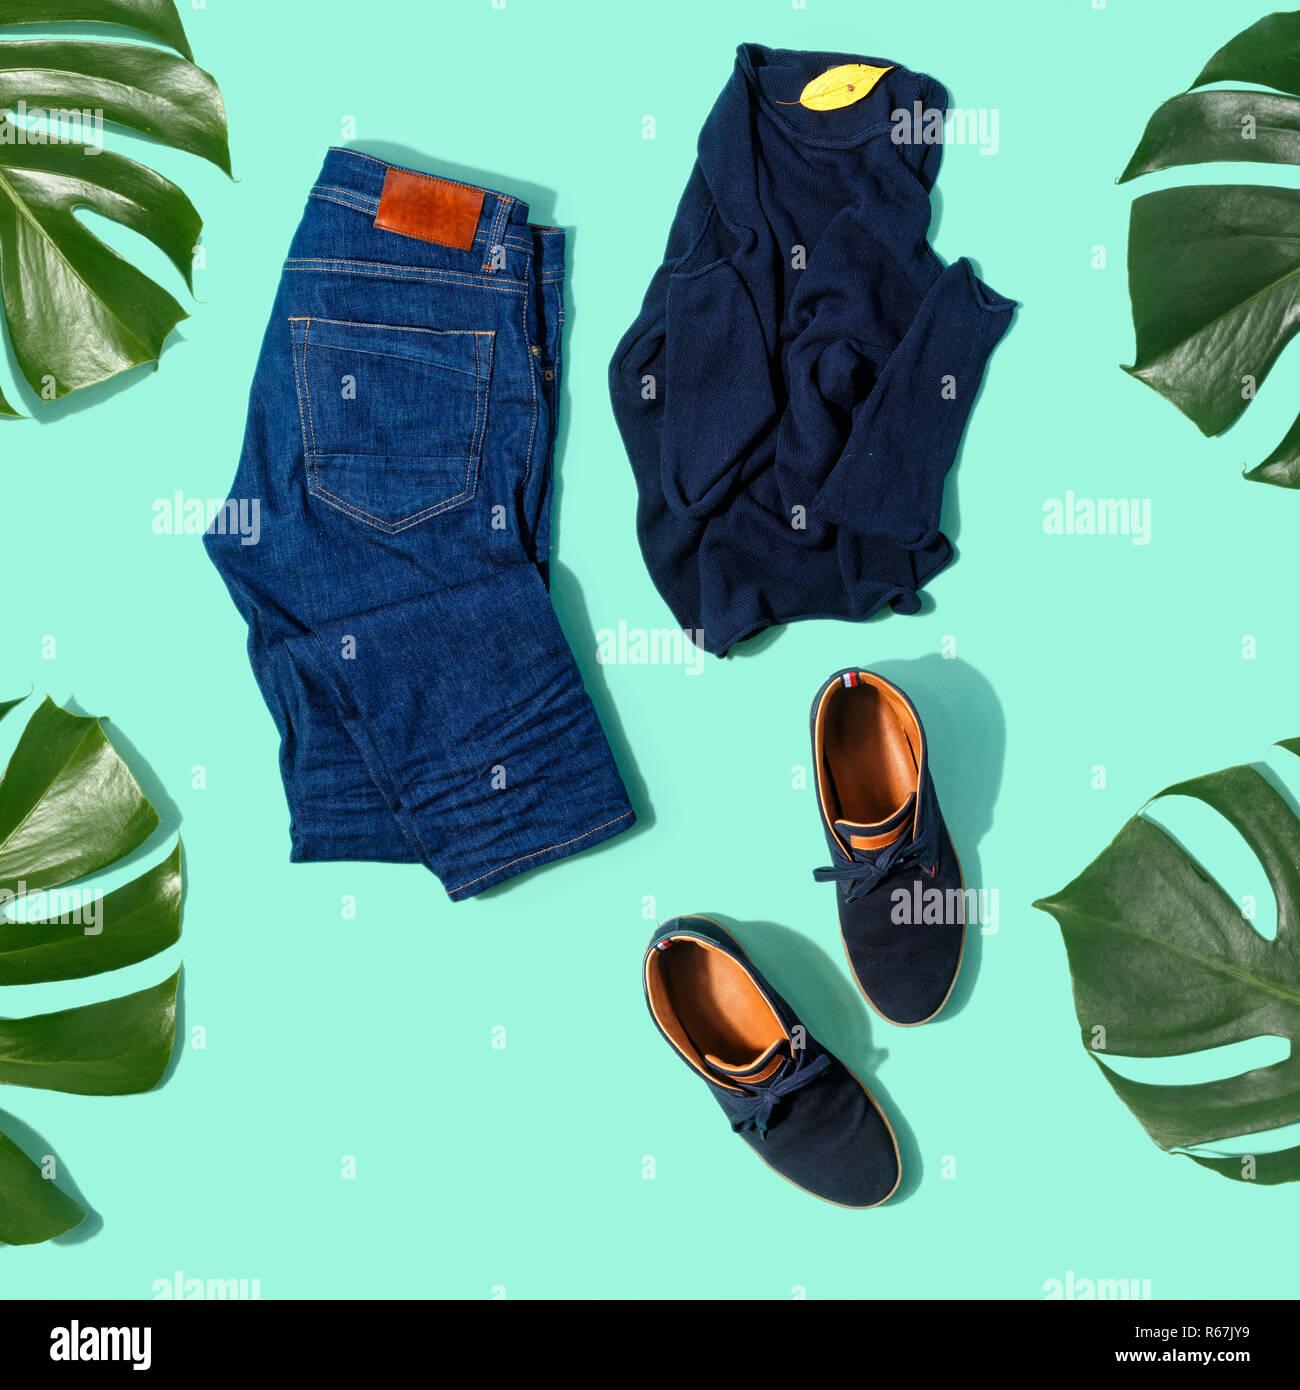 58926698b Plano conjunto laicos otoño ropa masculina jeans, suéter y zapatos sobre  fondo turquesa vista superior